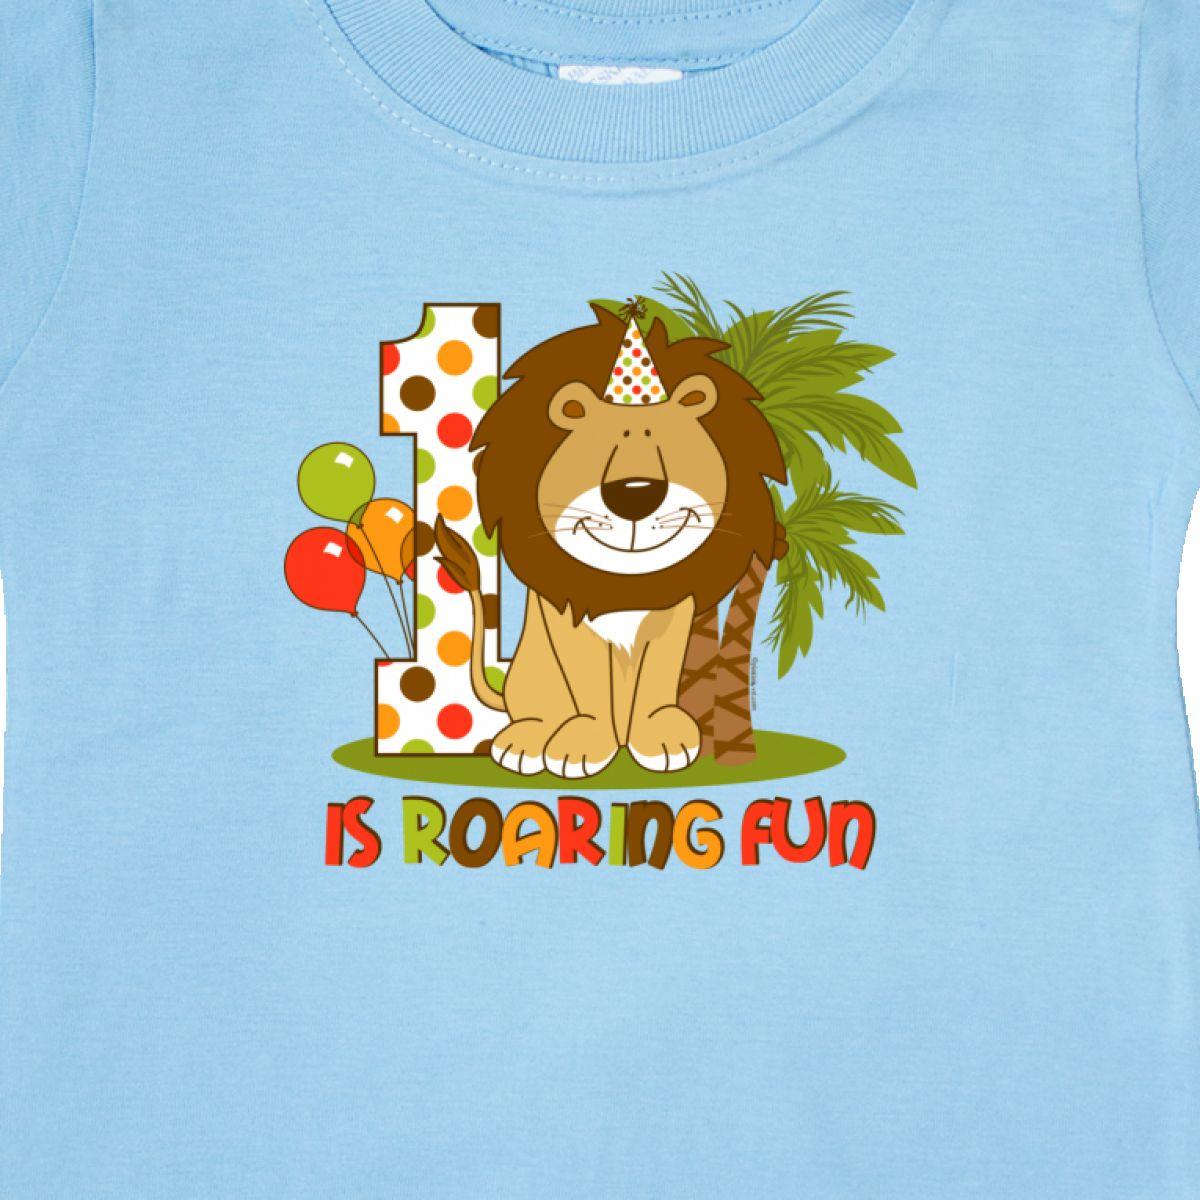 Inktastic-Cute-Lion-1st-Birthday-Baby-T-Shirt-Roaring-Fun-Pinkinkartkids-First thumbnail 12